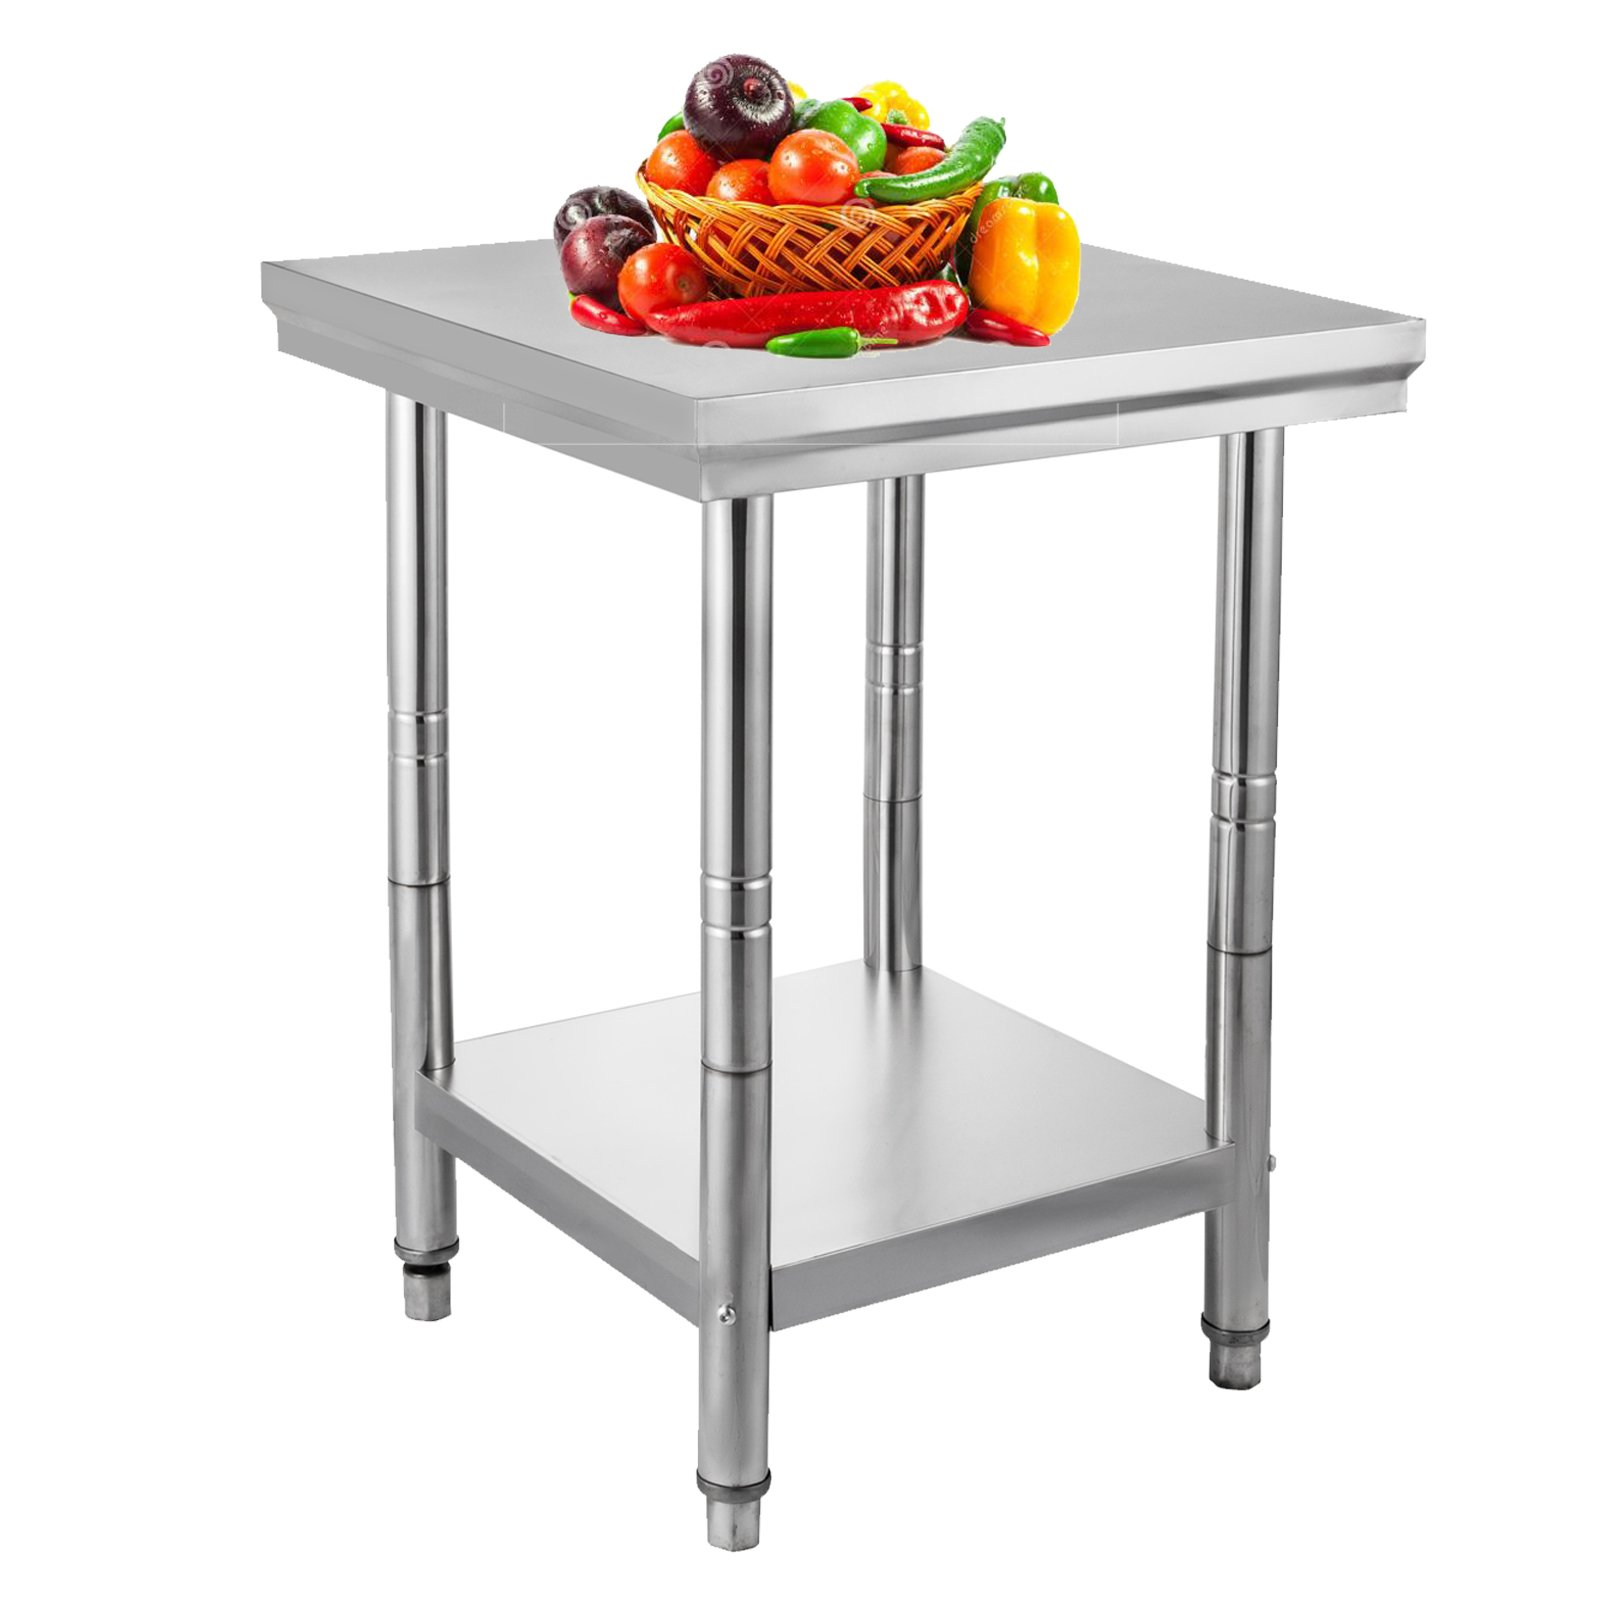 VEVOR NSF Stainless Steel Work Table Prep Work Table for Commercial Kitchen Restaurant (24x24x32 IN) by VEVOR